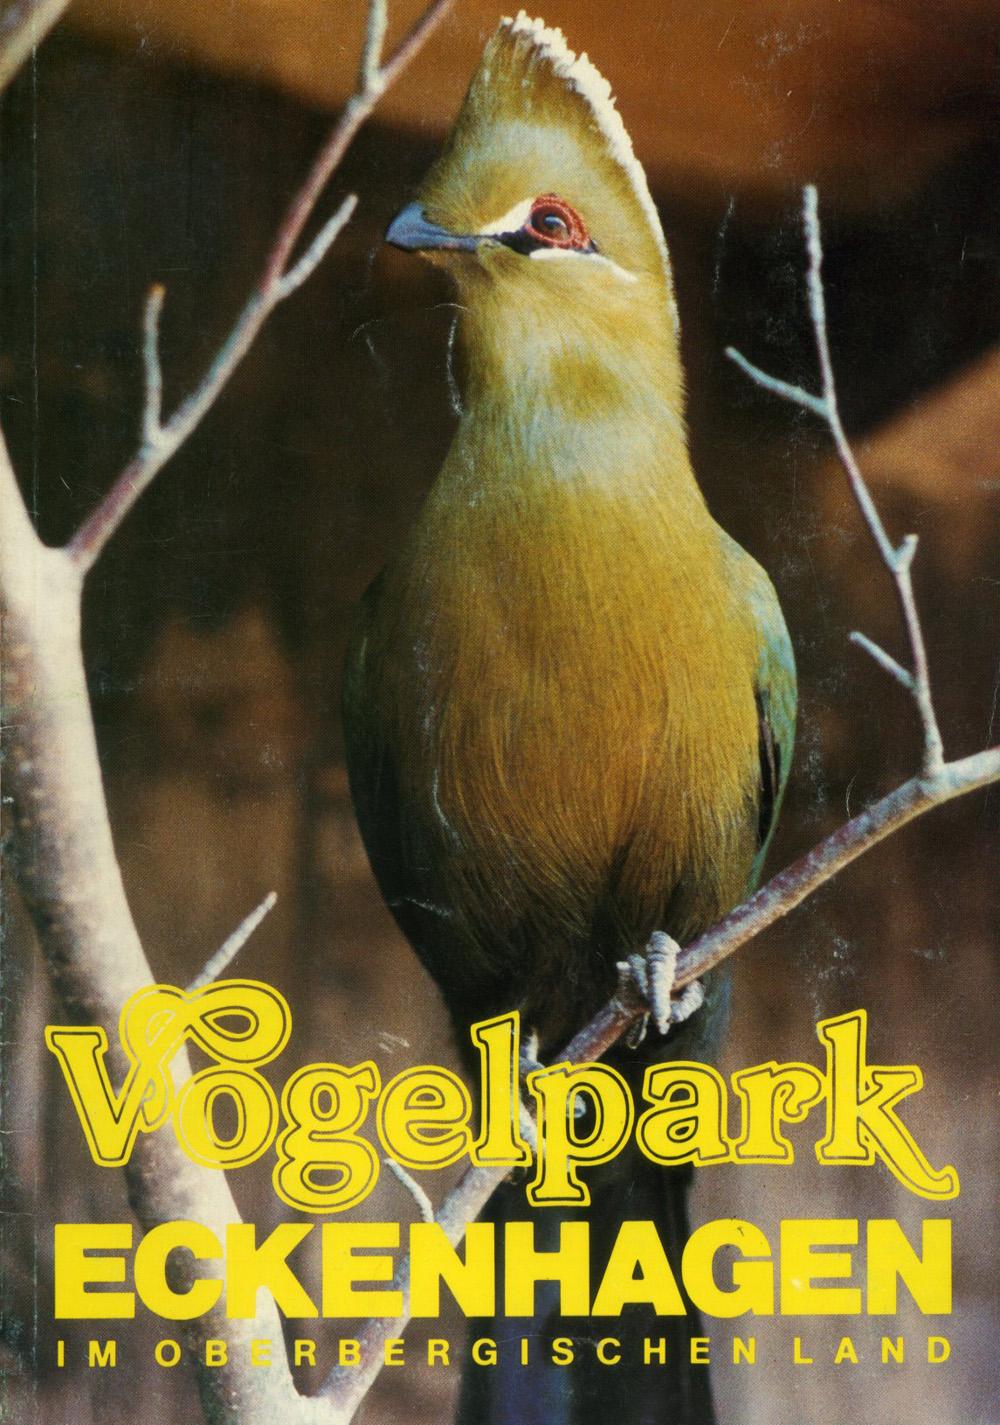 les zoos dans le monde affen und vogelpark eckenhagen. Black Bedroom Furniture Sets. Home Design Ideas